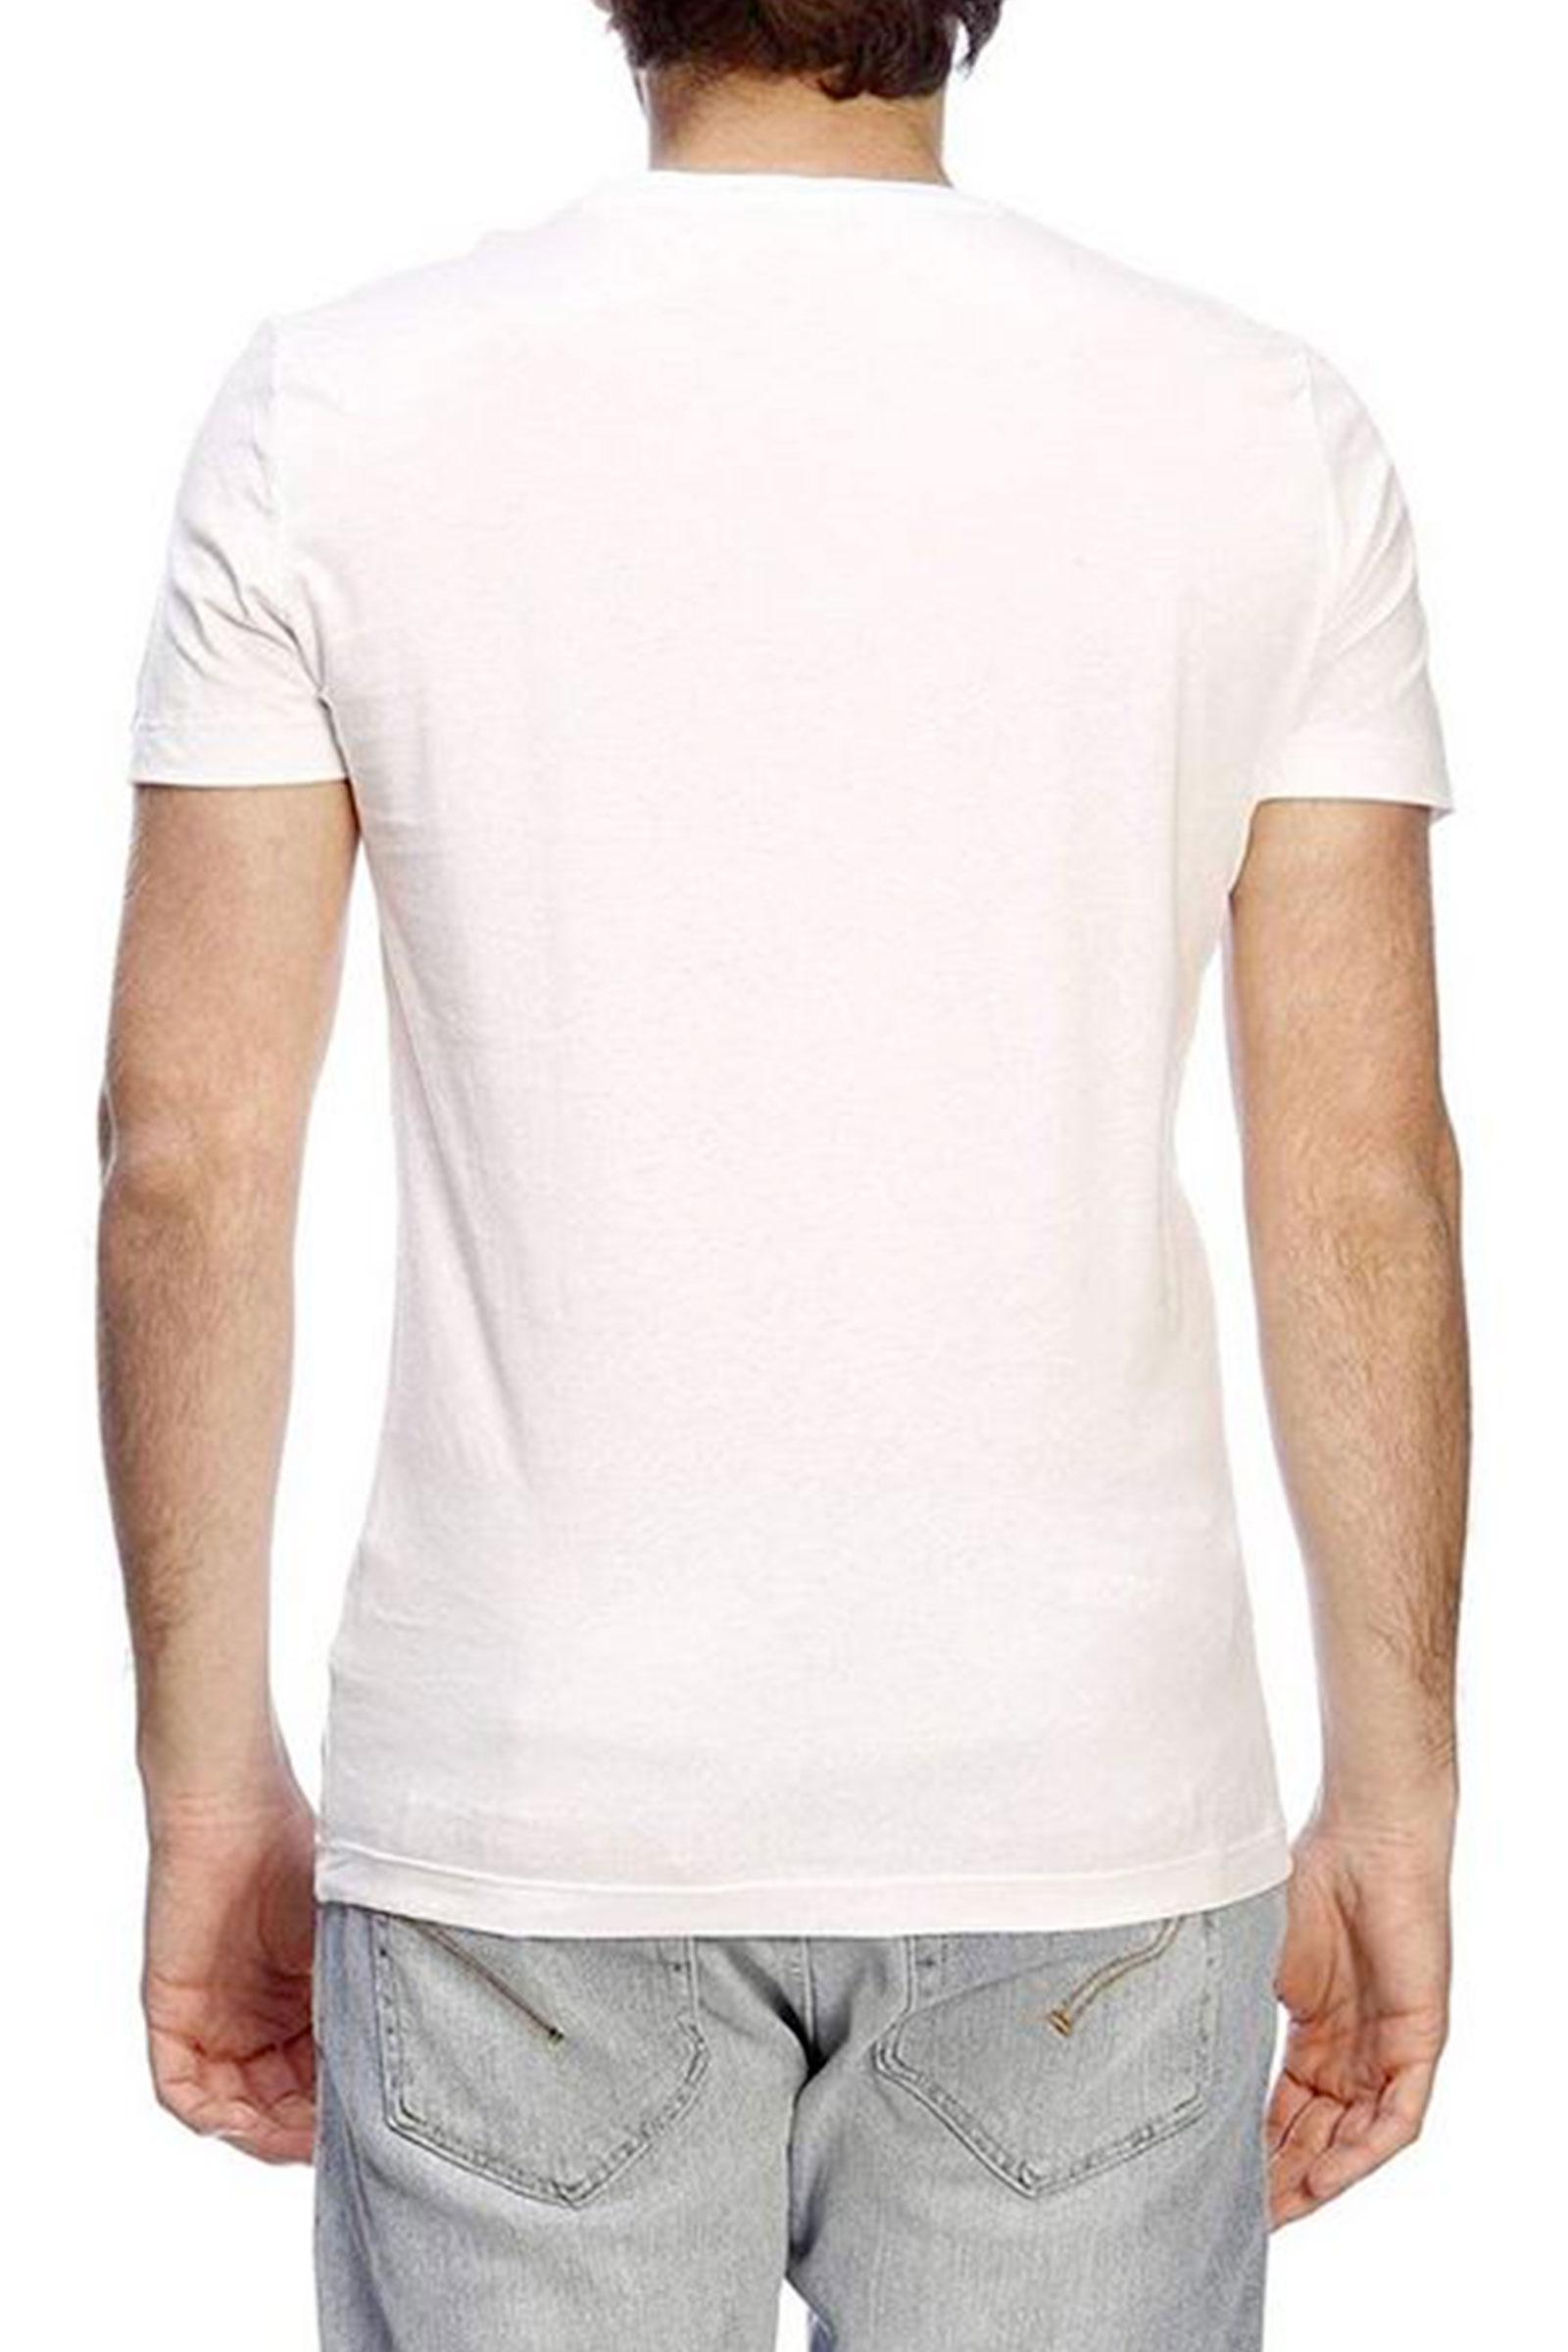 CALVIN KLEIN JEANS T-Shirt Uomo CALVIN KLEIN JEANS | T-Shirt | J30J307856YAF